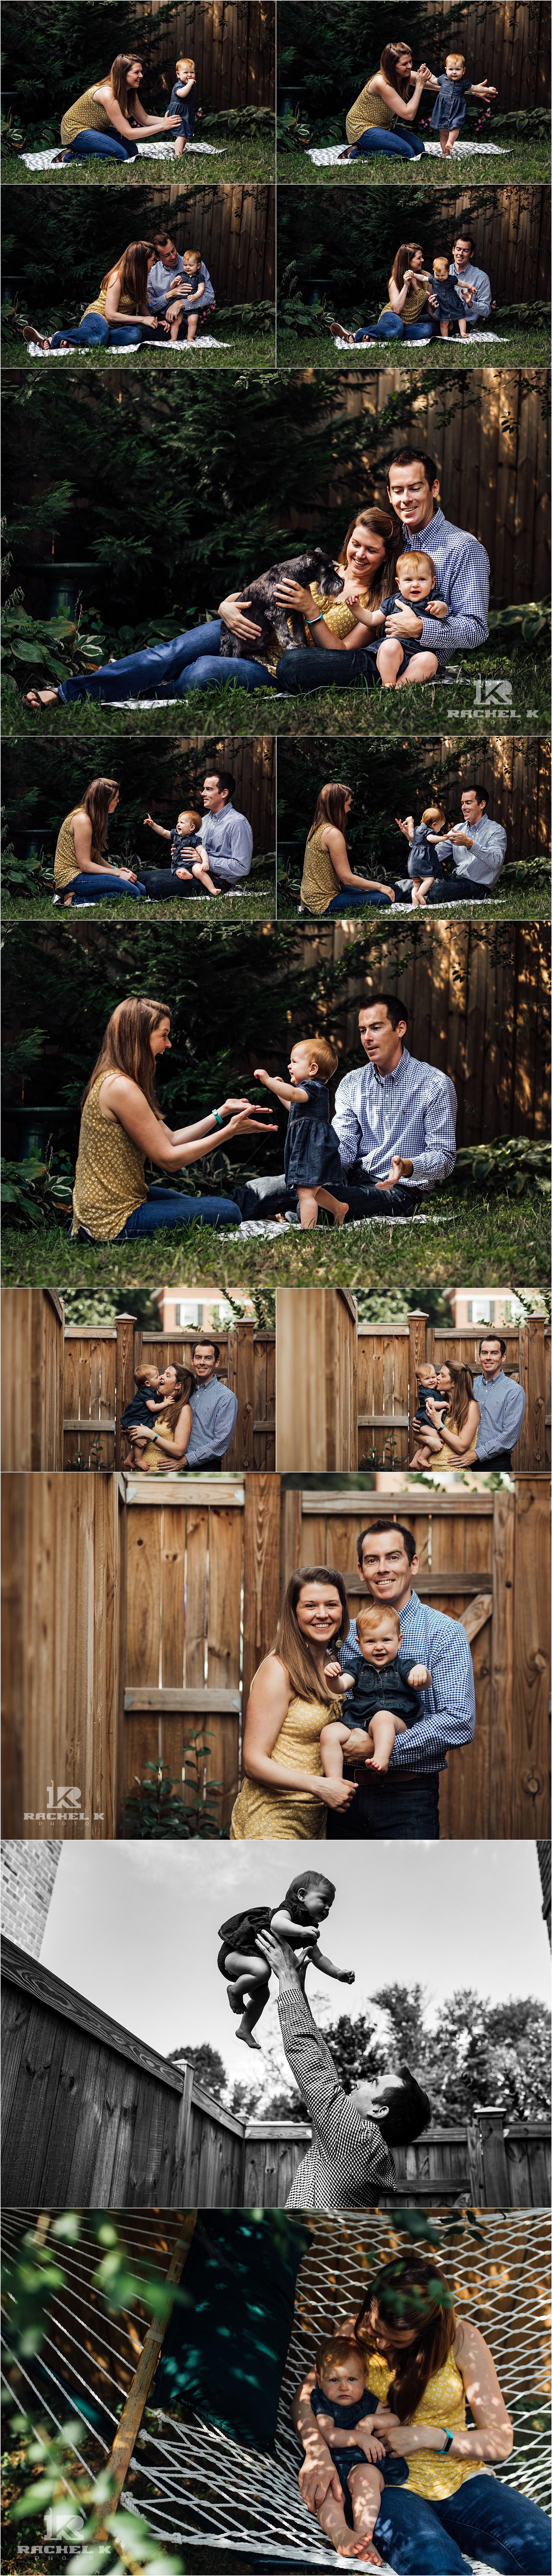 Arlington Virginia backyard family session by Rachel K Photo